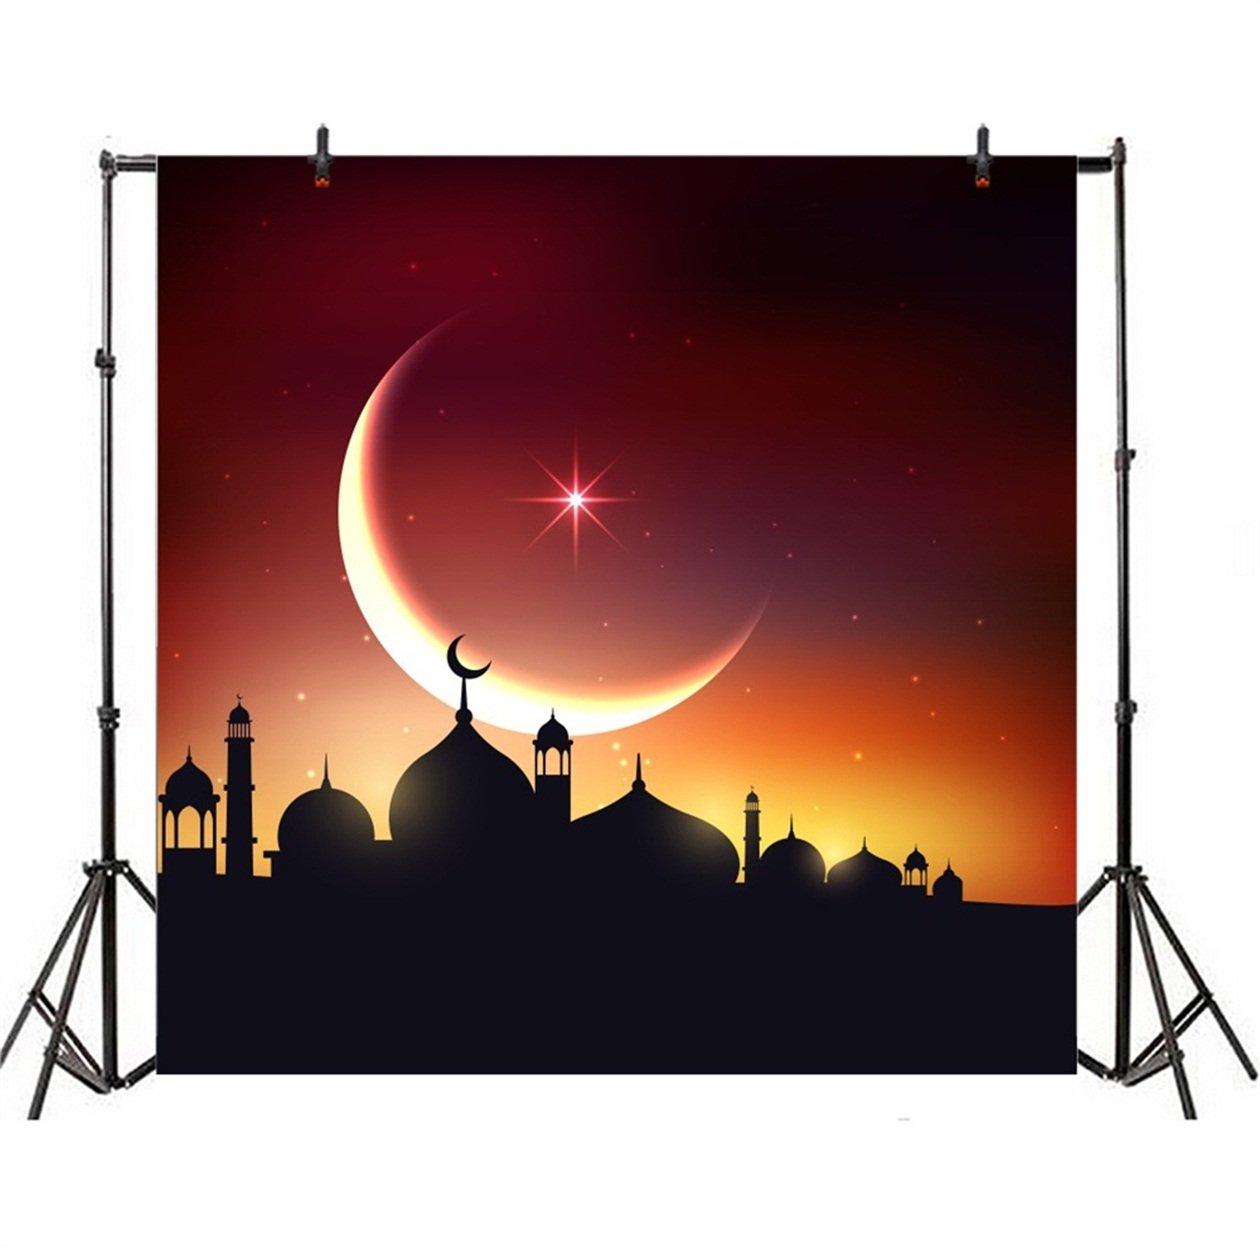 a37fbedccf3 Amazon.com  CSFOTO 8x8ft Background for Mosque Night Silhouette Photography  Backdrop Ramadan Muslim Islam Religion God Arabic Islamic Pray Arab Eid ...